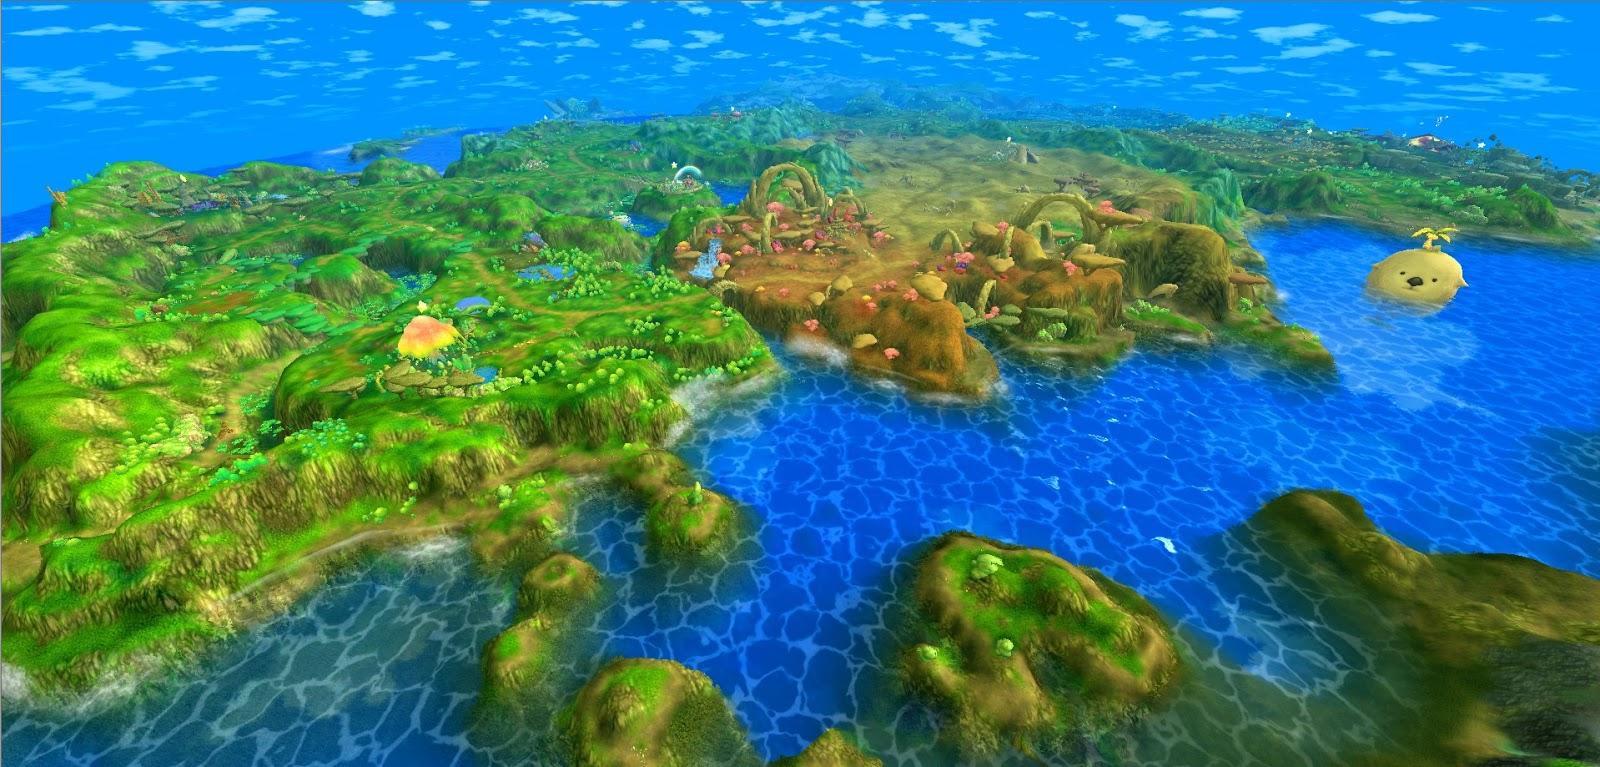 星界神話 world map